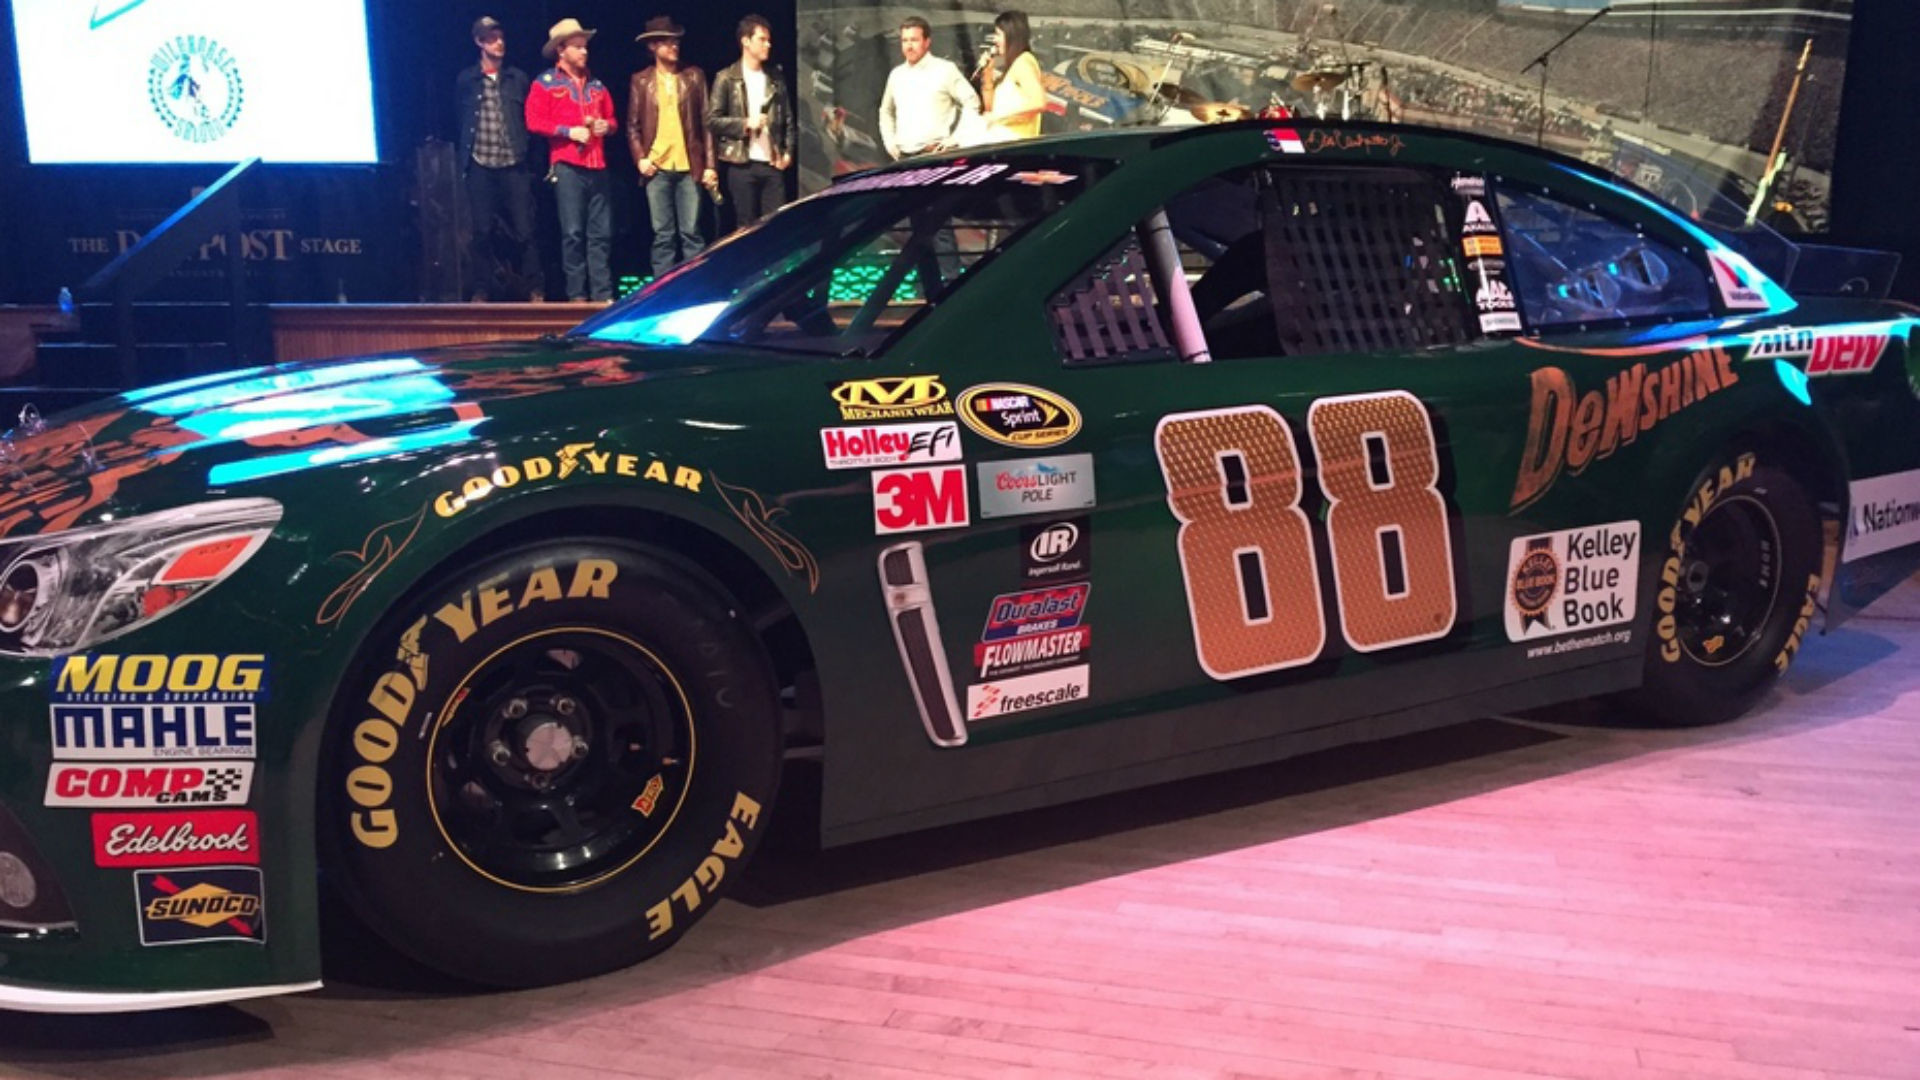 Dale Earnhardt Jr. reveals Bristol paint scheme, talks Fontana   NASCAR    Sporting News